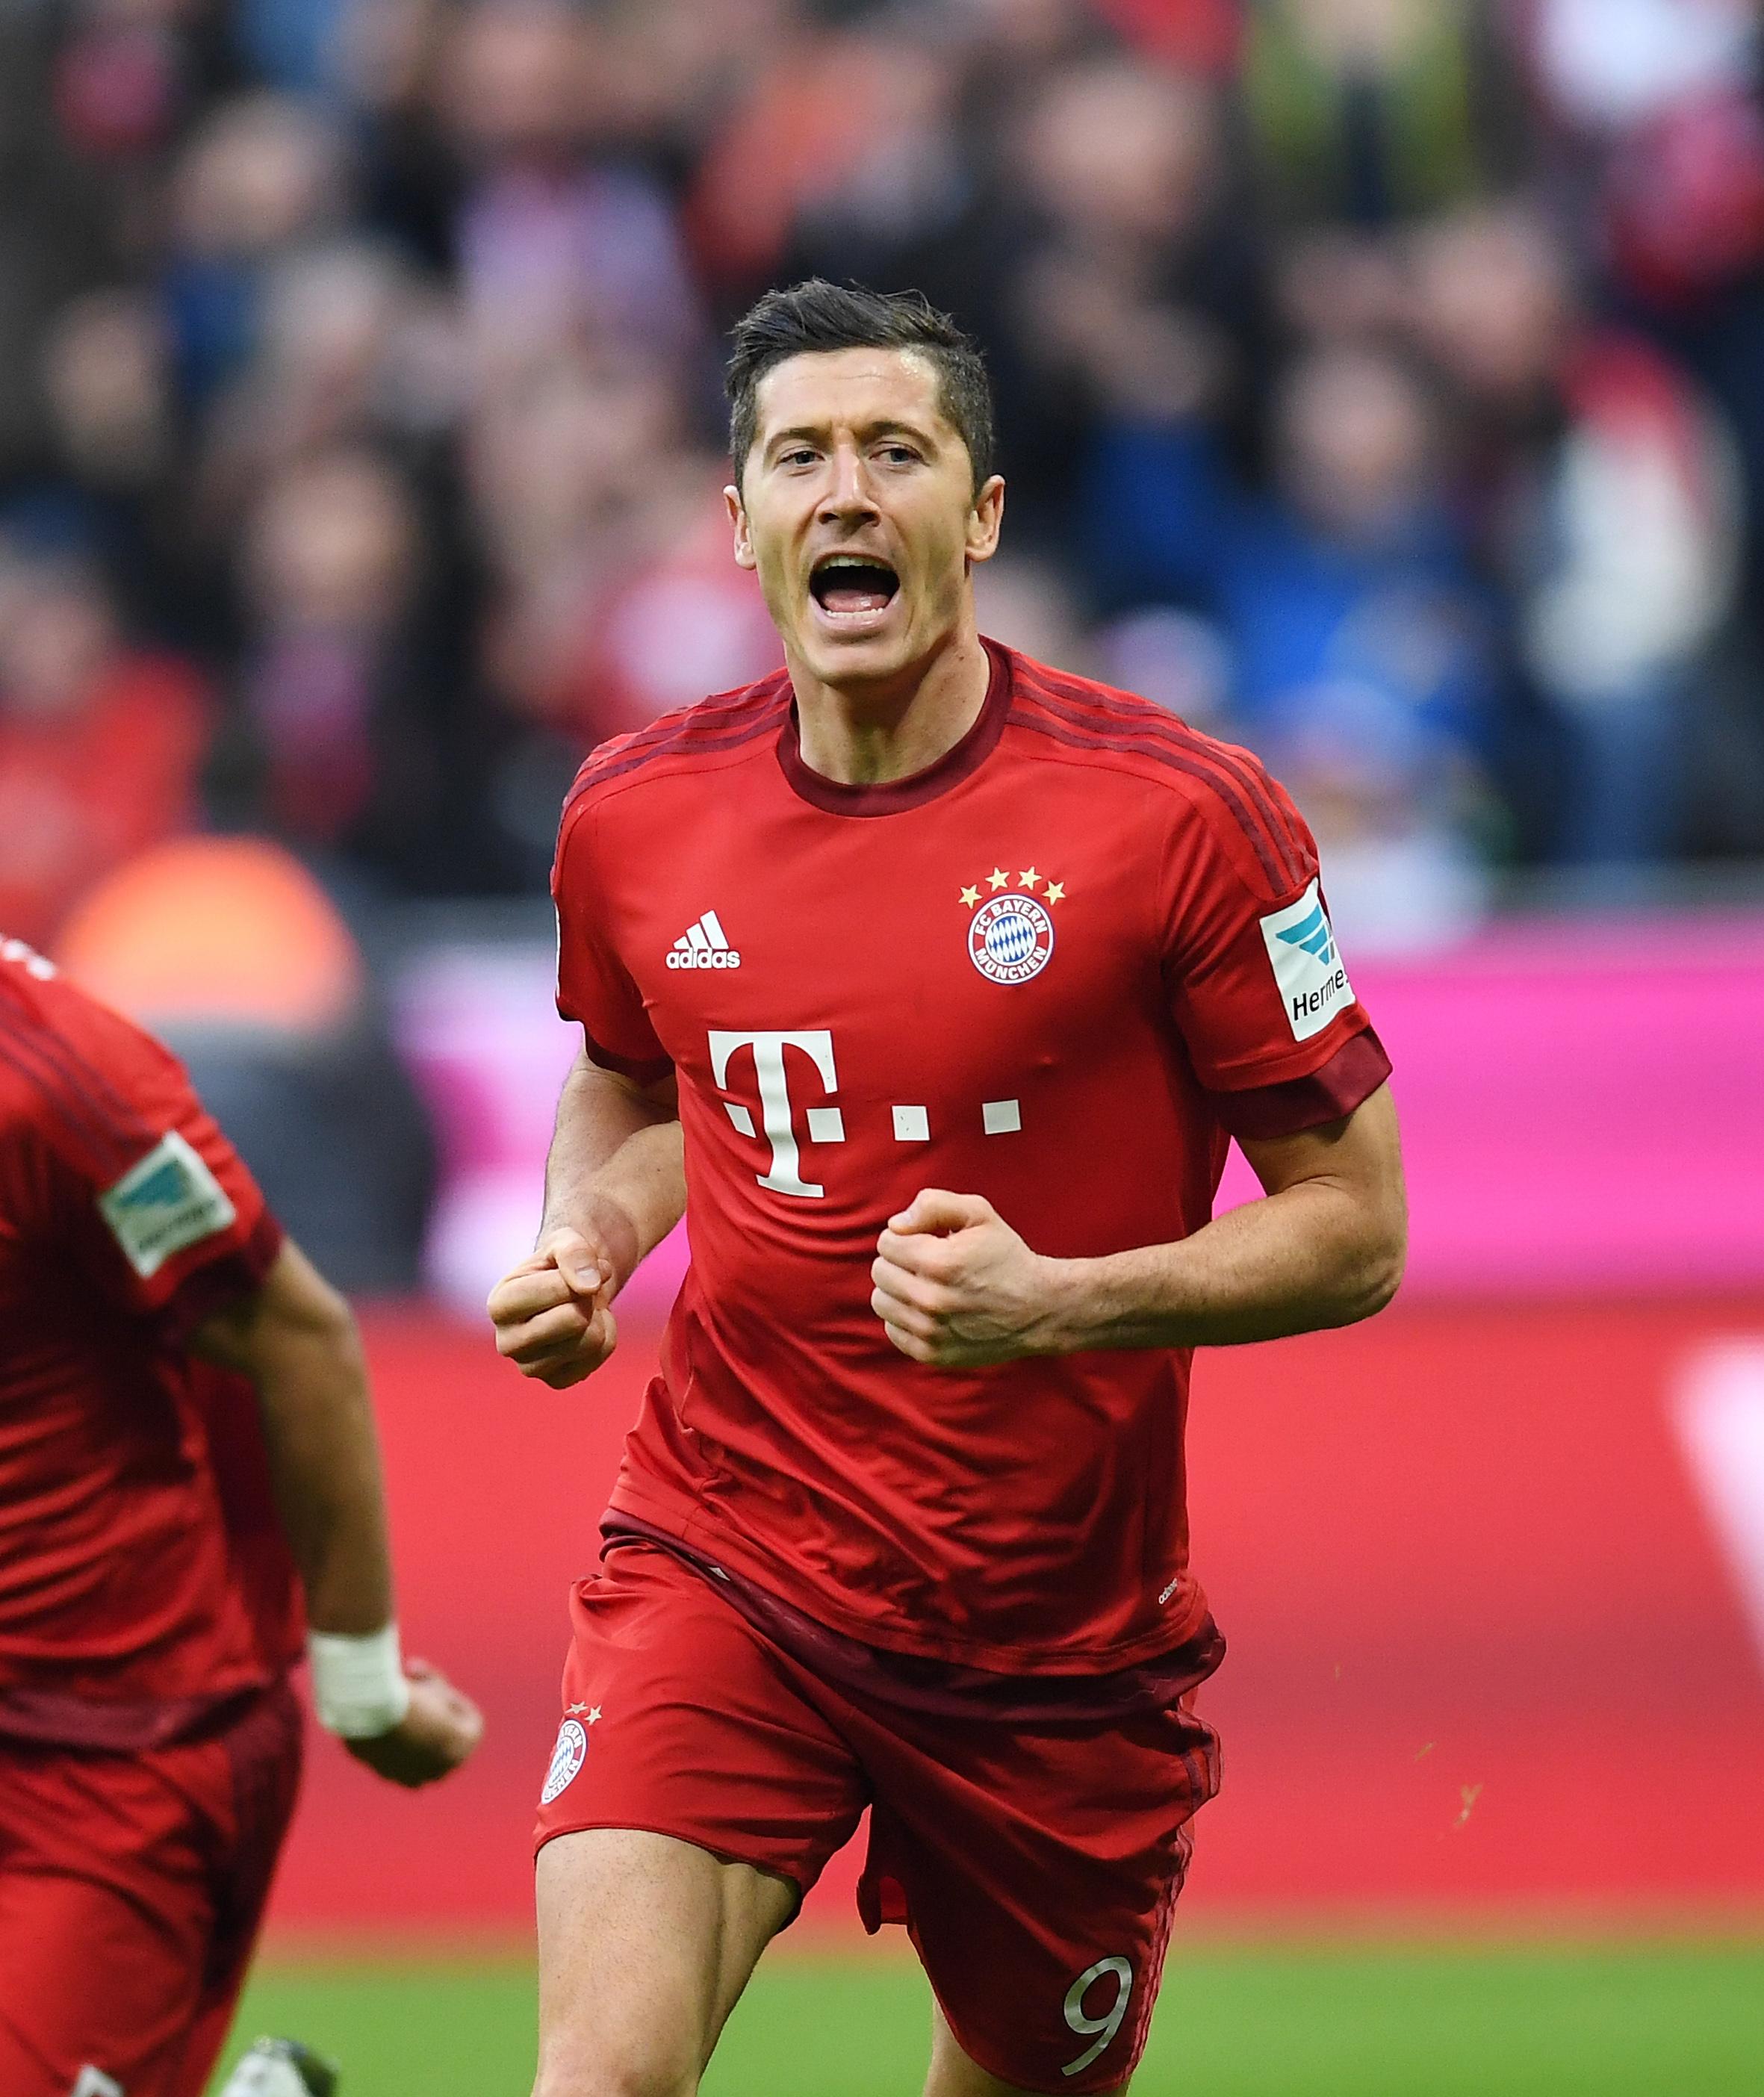 Fussball 1. Bundesliga Saison 15/16: FC Bayern Muenchen - FC Schalke 04